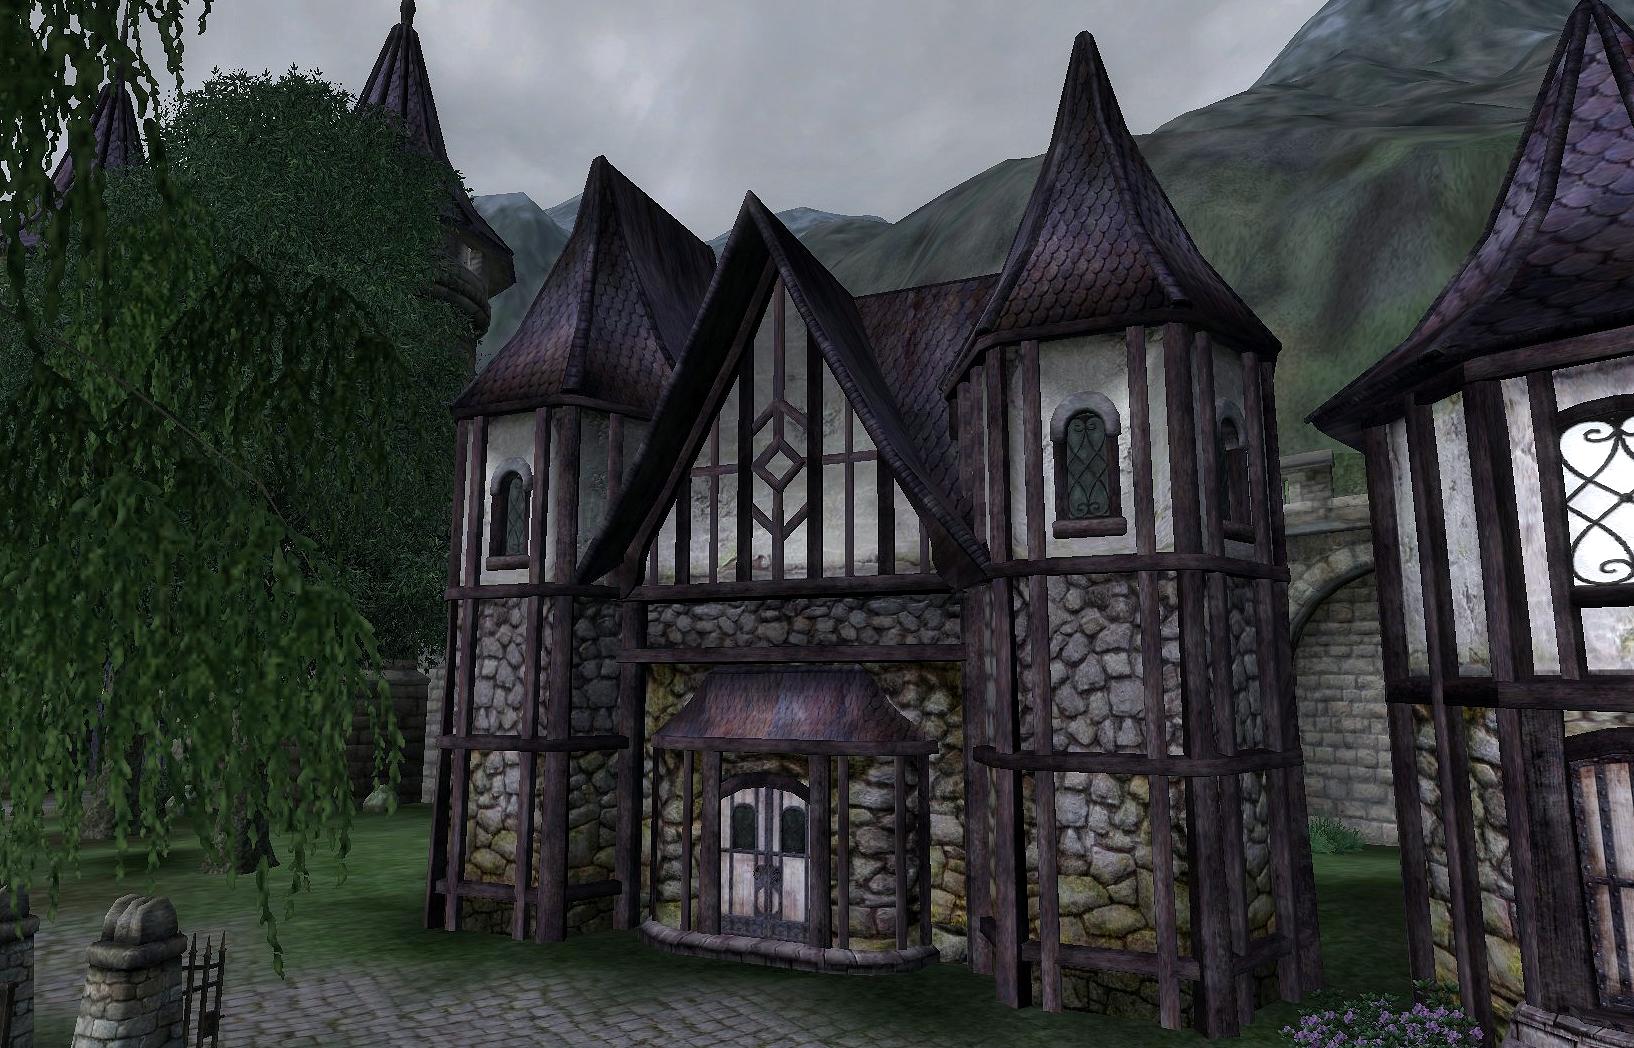 Bazur Gro-Gharz's House